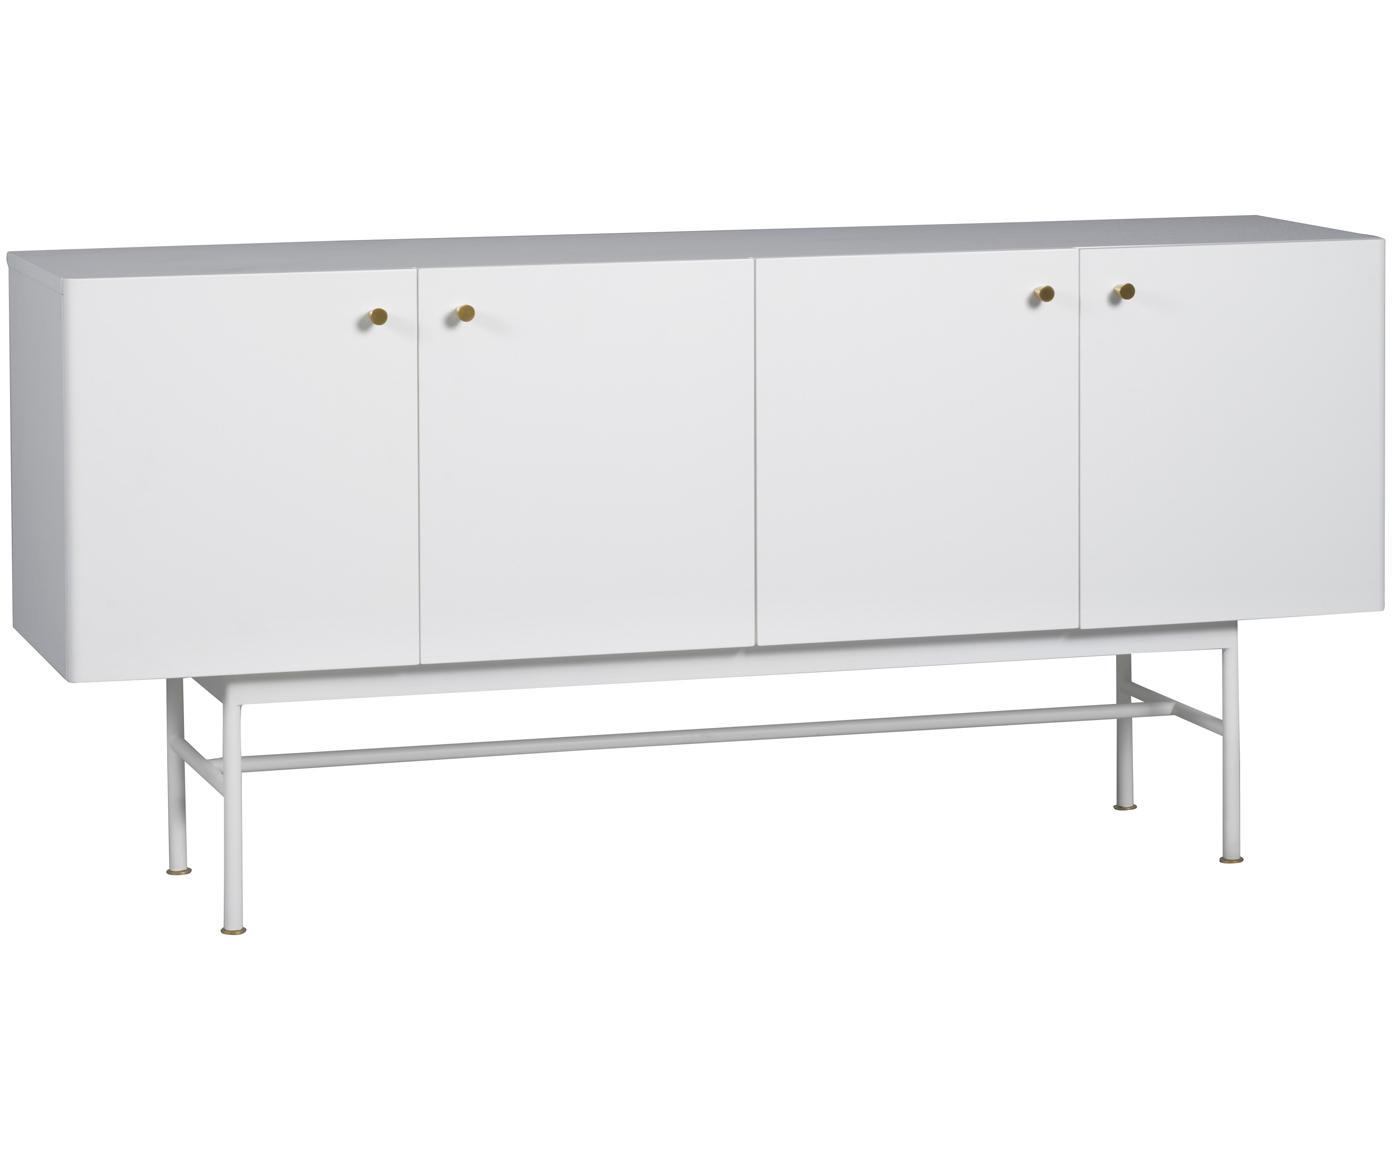 Credenza di design Glendale, Legno di quercia, bianco, Larg. 160 x Alt. 75 cm